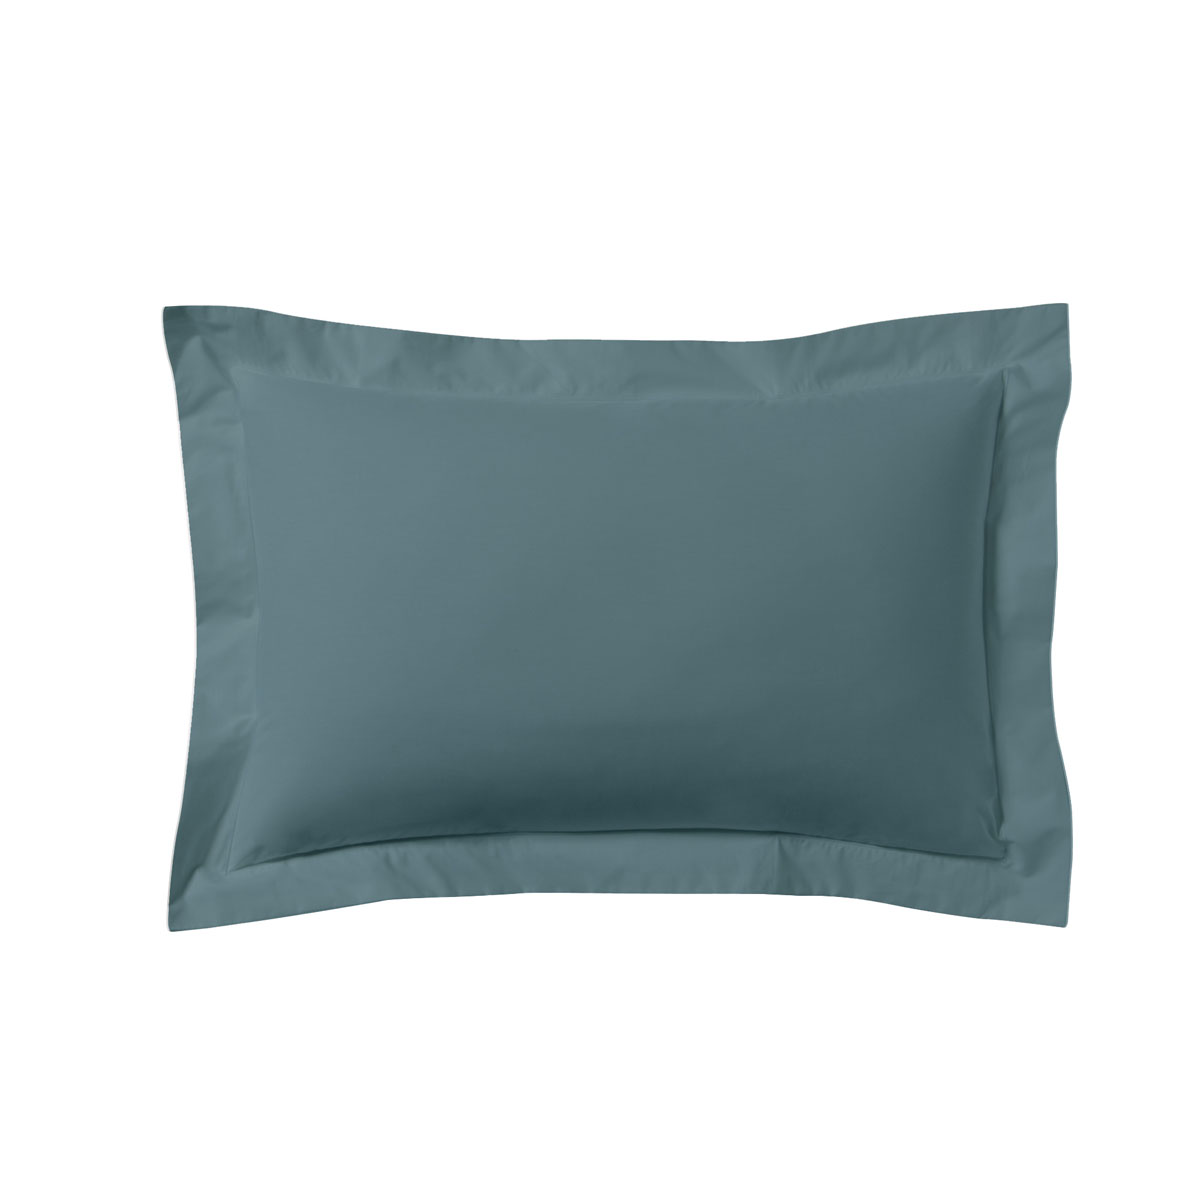 Taie d'oreiller unie en coton, Made in France bleu 50x70